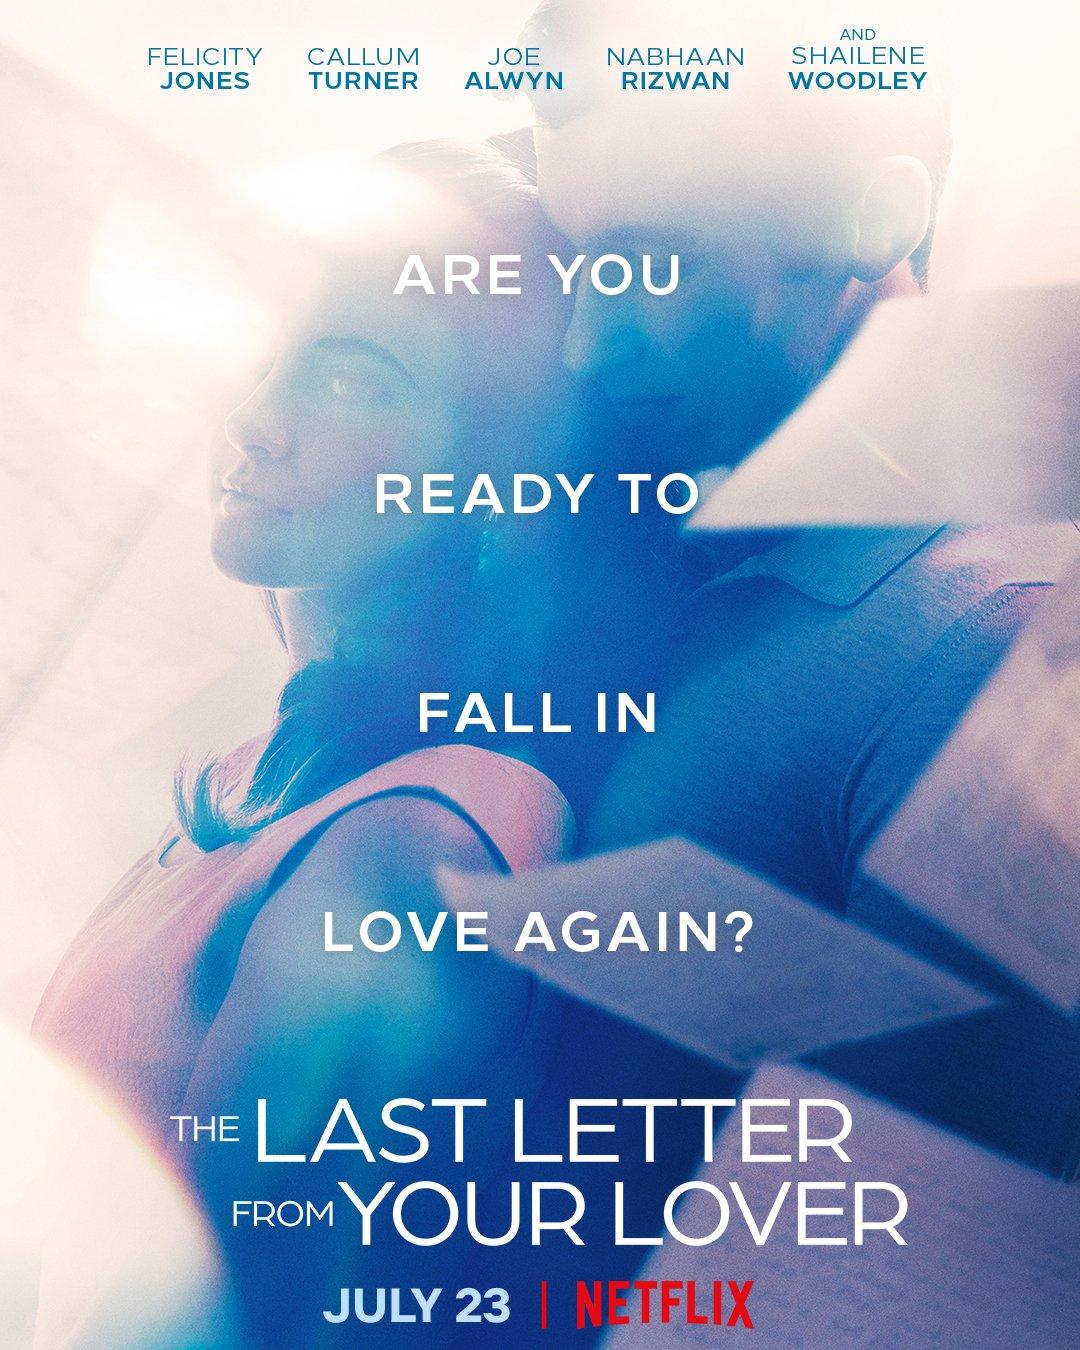 A Última Carta de Amor | Shailene Woodley e Felicity Jones